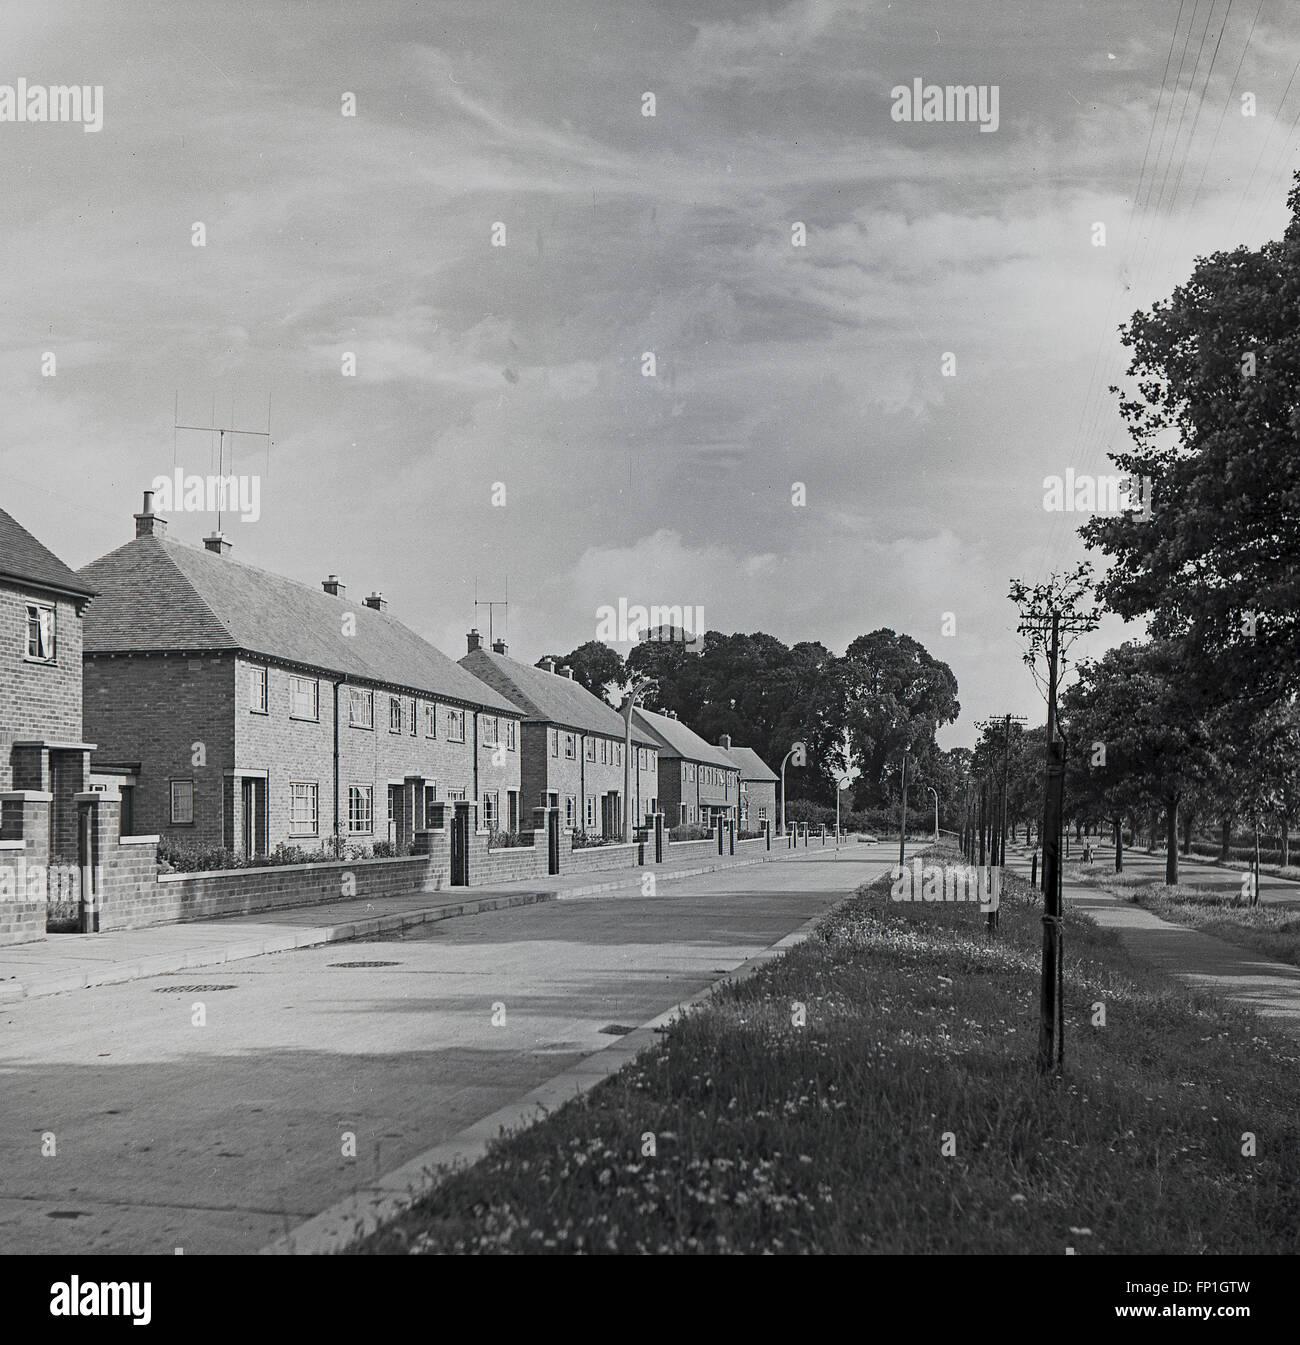 kettering northamptonshire stock photos & kettering